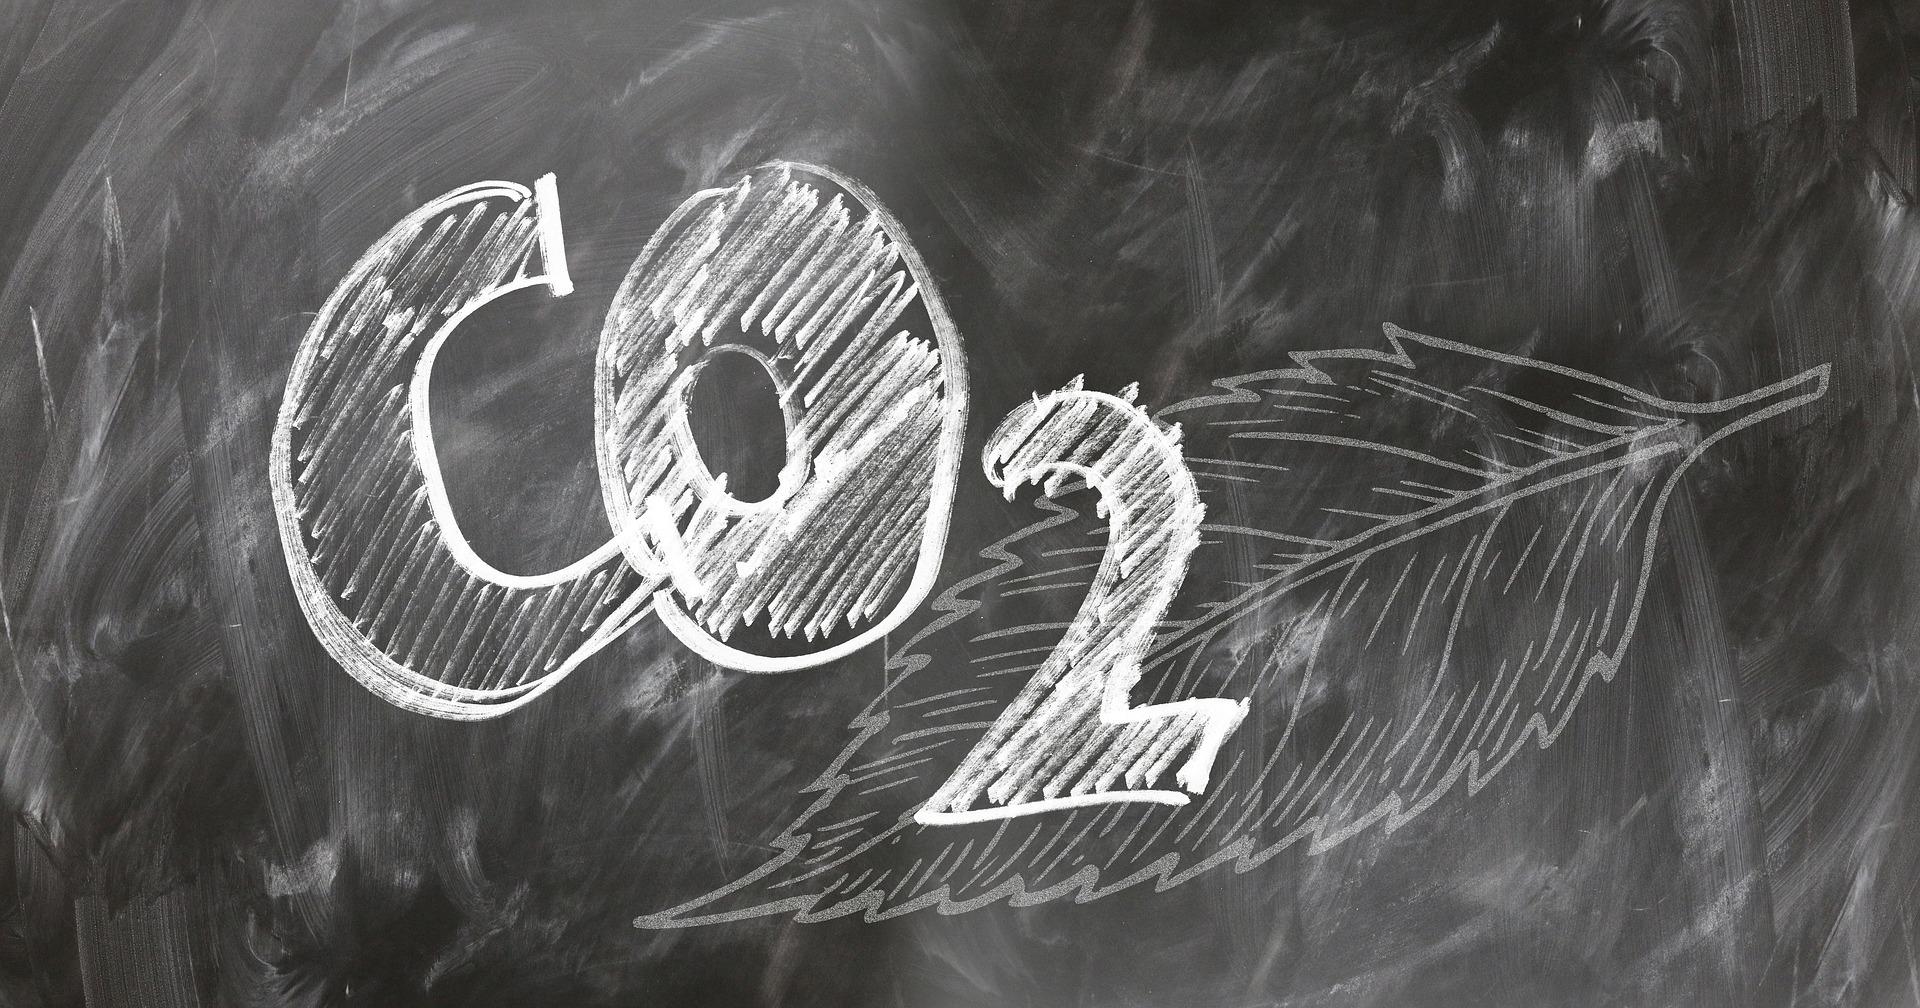 CO²-Emissionen